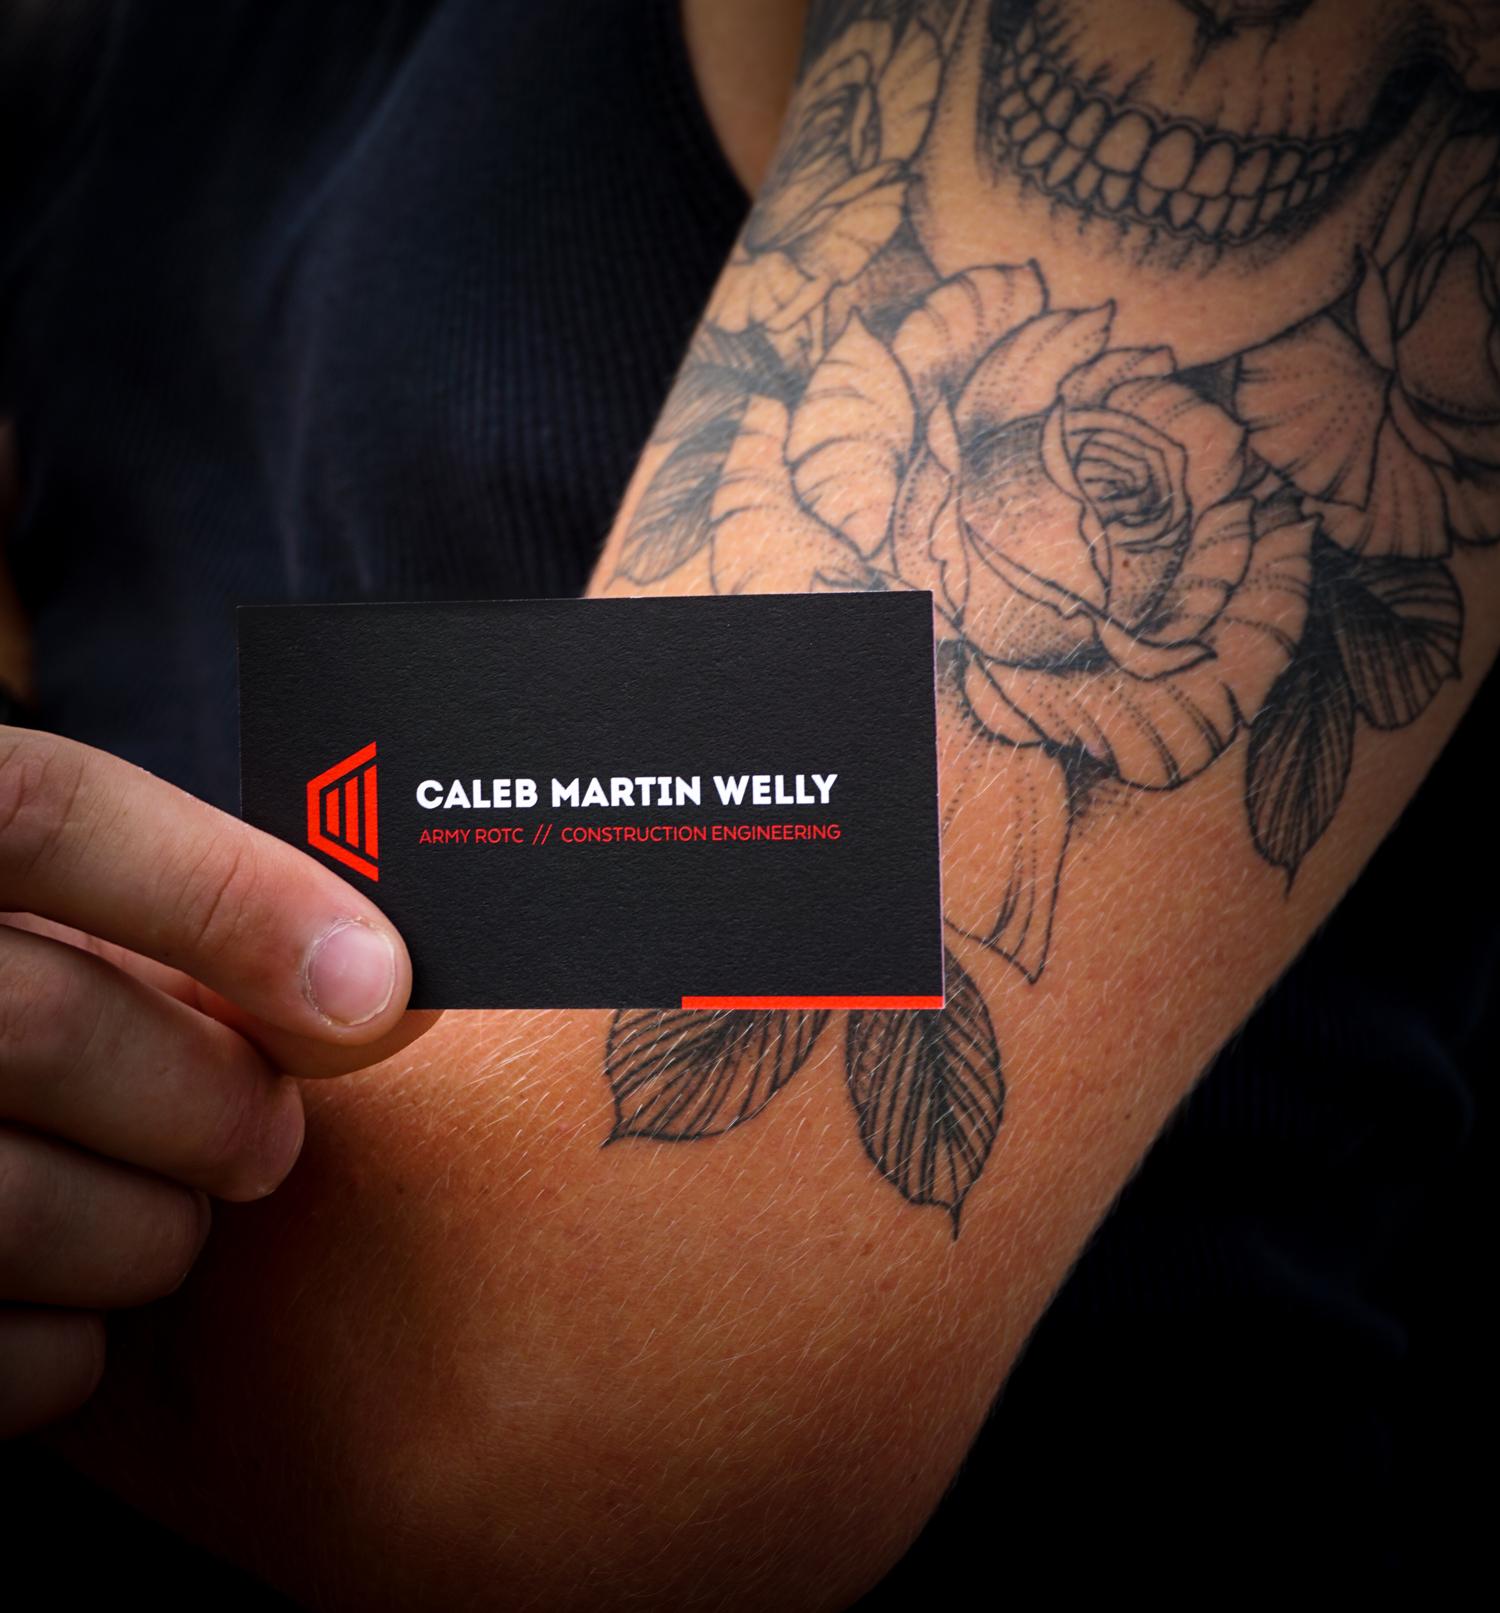 Caleb-Business-Card-Mockup-8-web.jpg